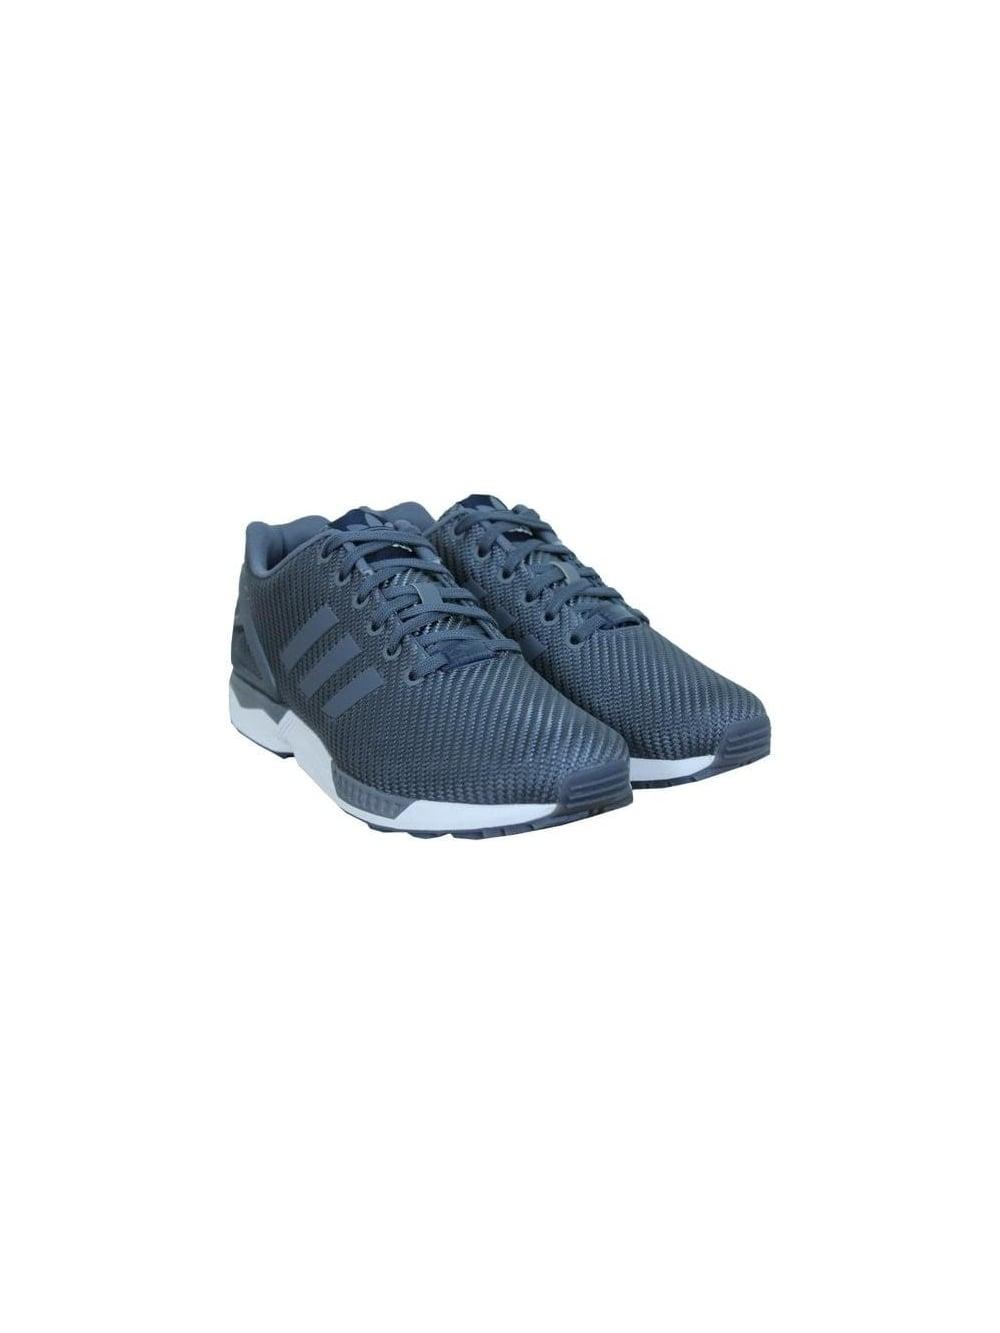 buy popular 4f62c 75dc8 ZX Flux - Onyx White Blue